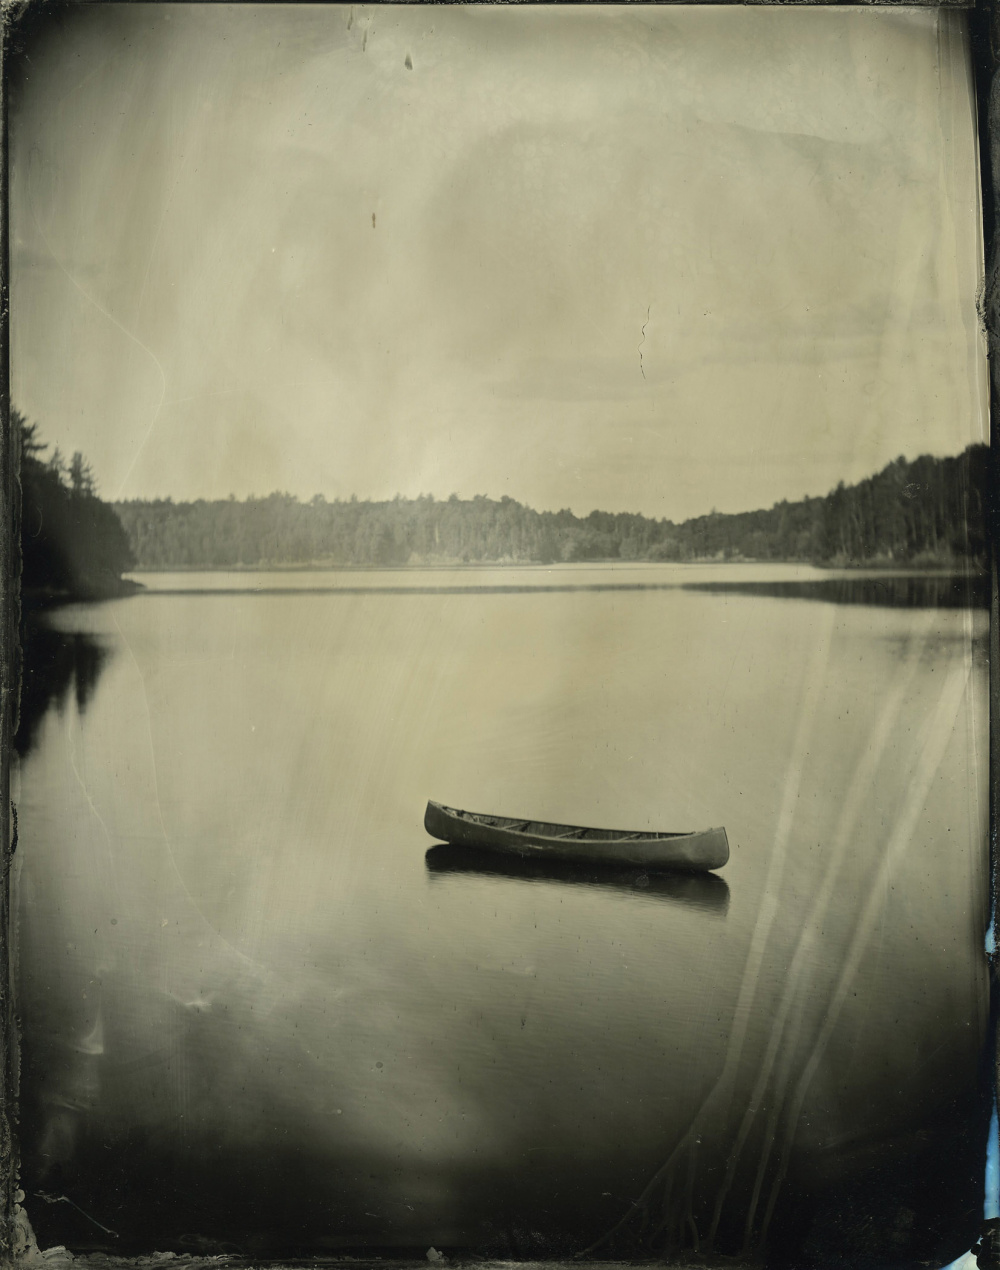 Curtis Wehrfritz, Lost Canoe #10, 2013